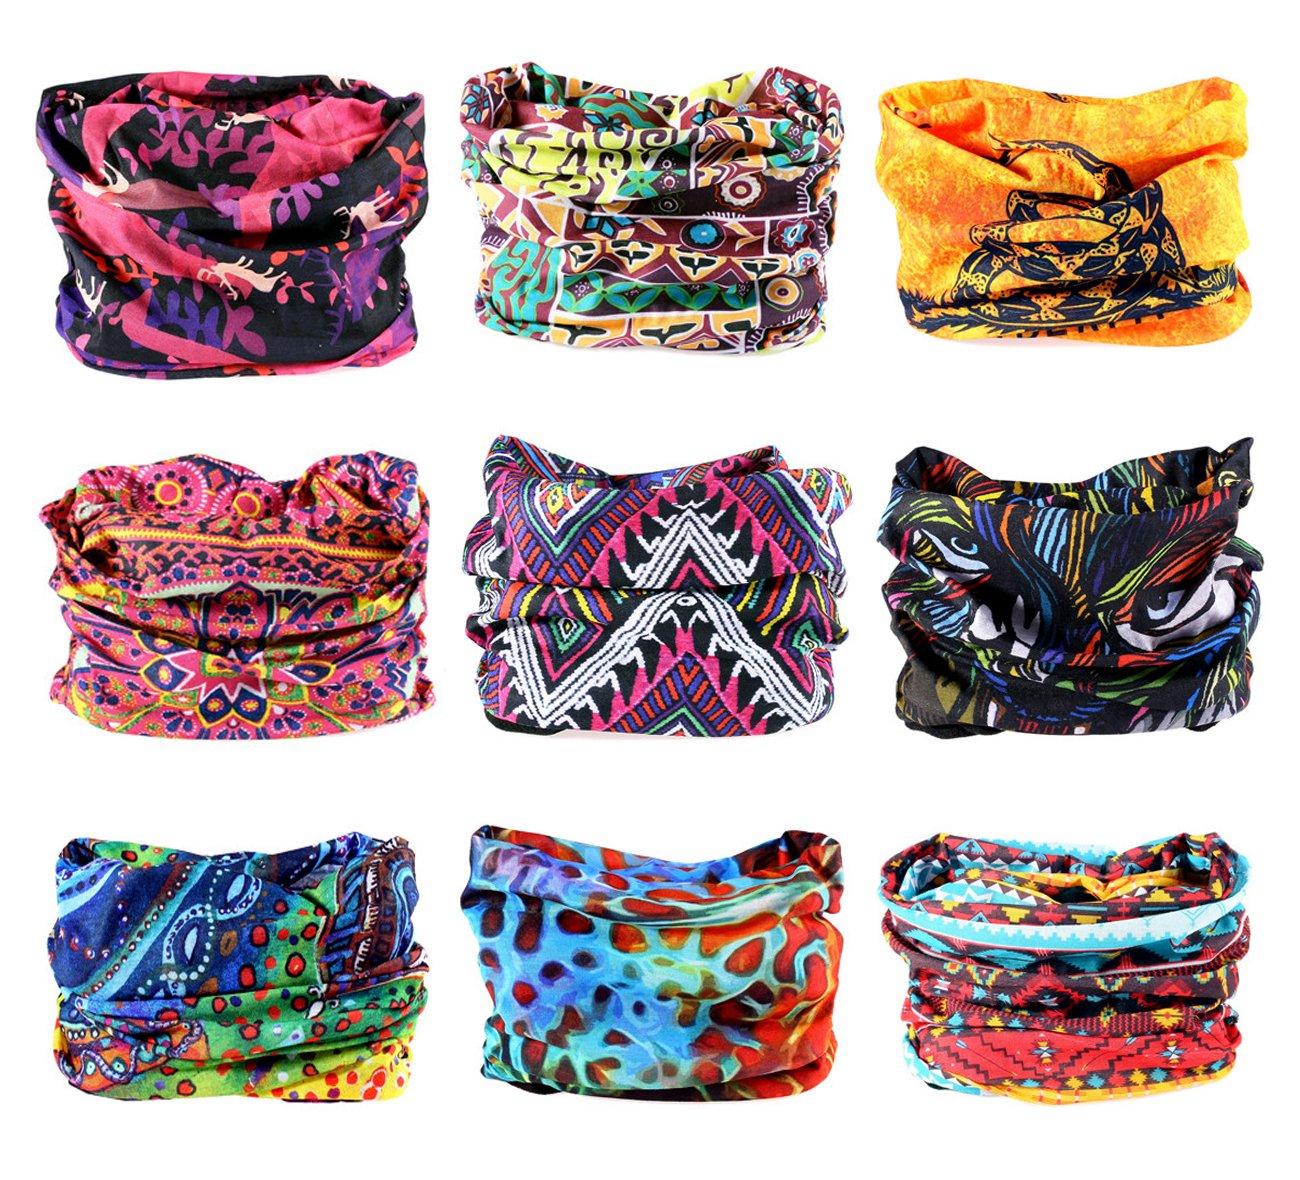 KINGREE 9PCS Headwear, Womens and Mens Headband, Guys Sweatband & Sports Head Tie for ATV/UTV Riding, Outdoor Magic Scarf, Bandanna Headwrap, (Indian Dreams)